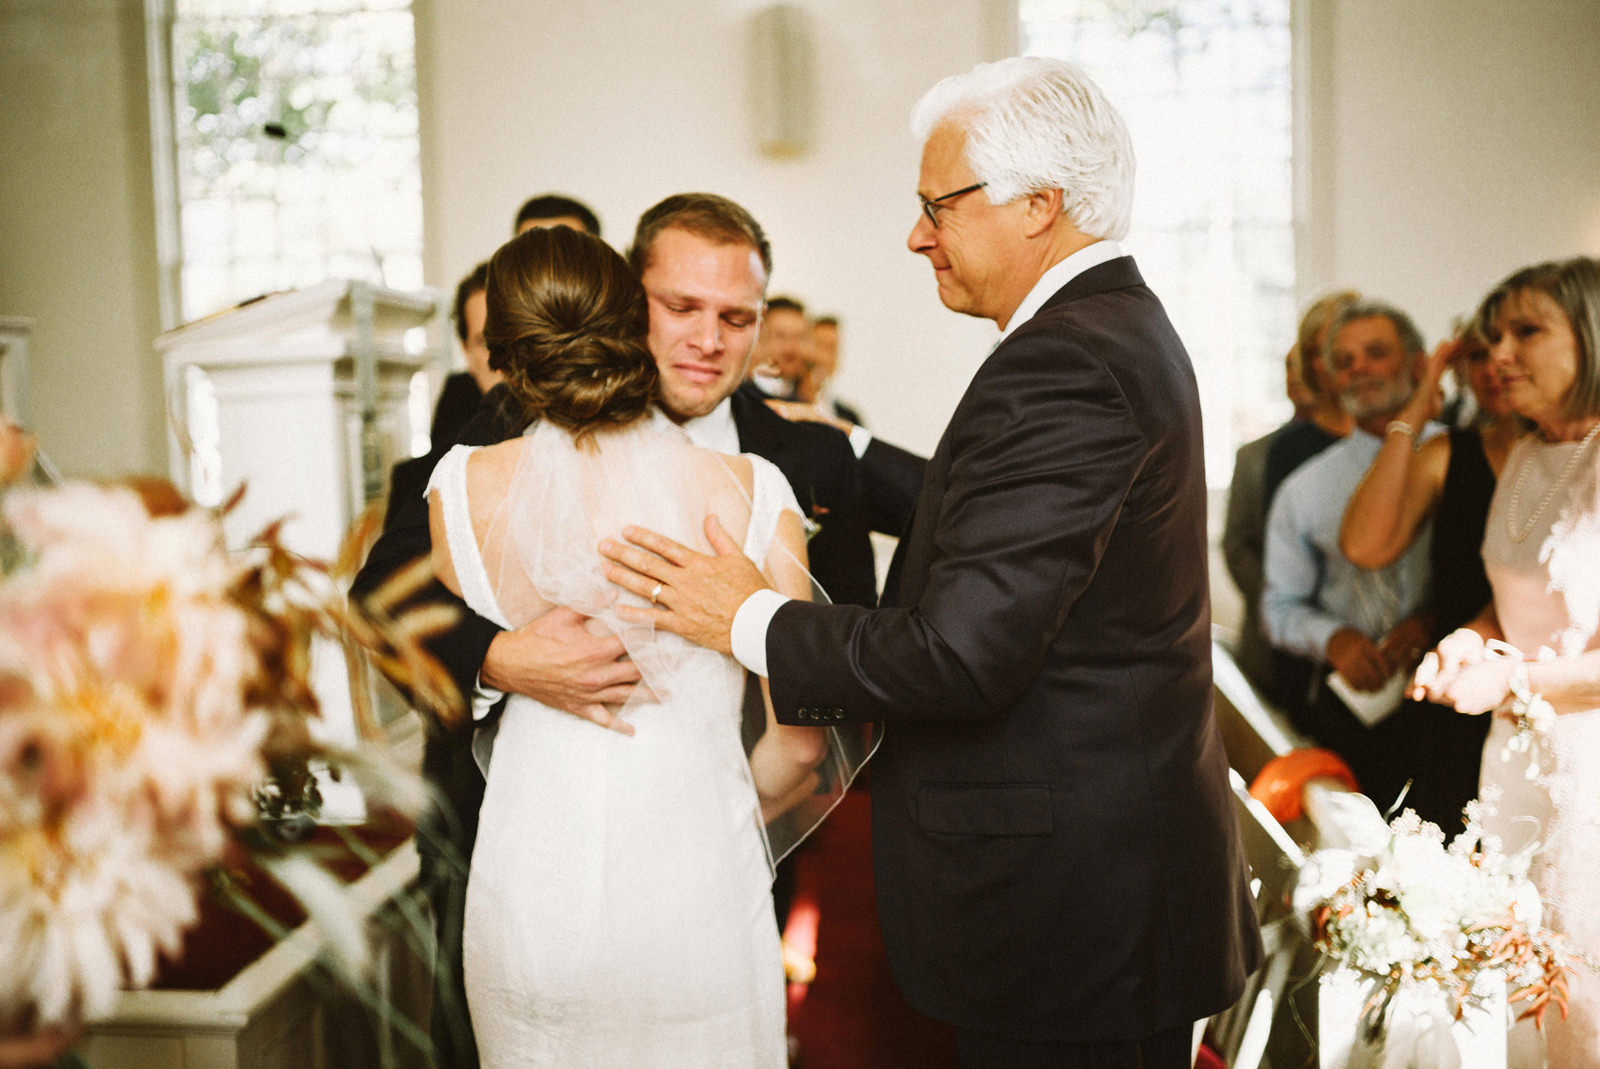 bridgeport-wedding-052 BRIDGEPORT, CONNECTICUT BACKYARD WEDDING